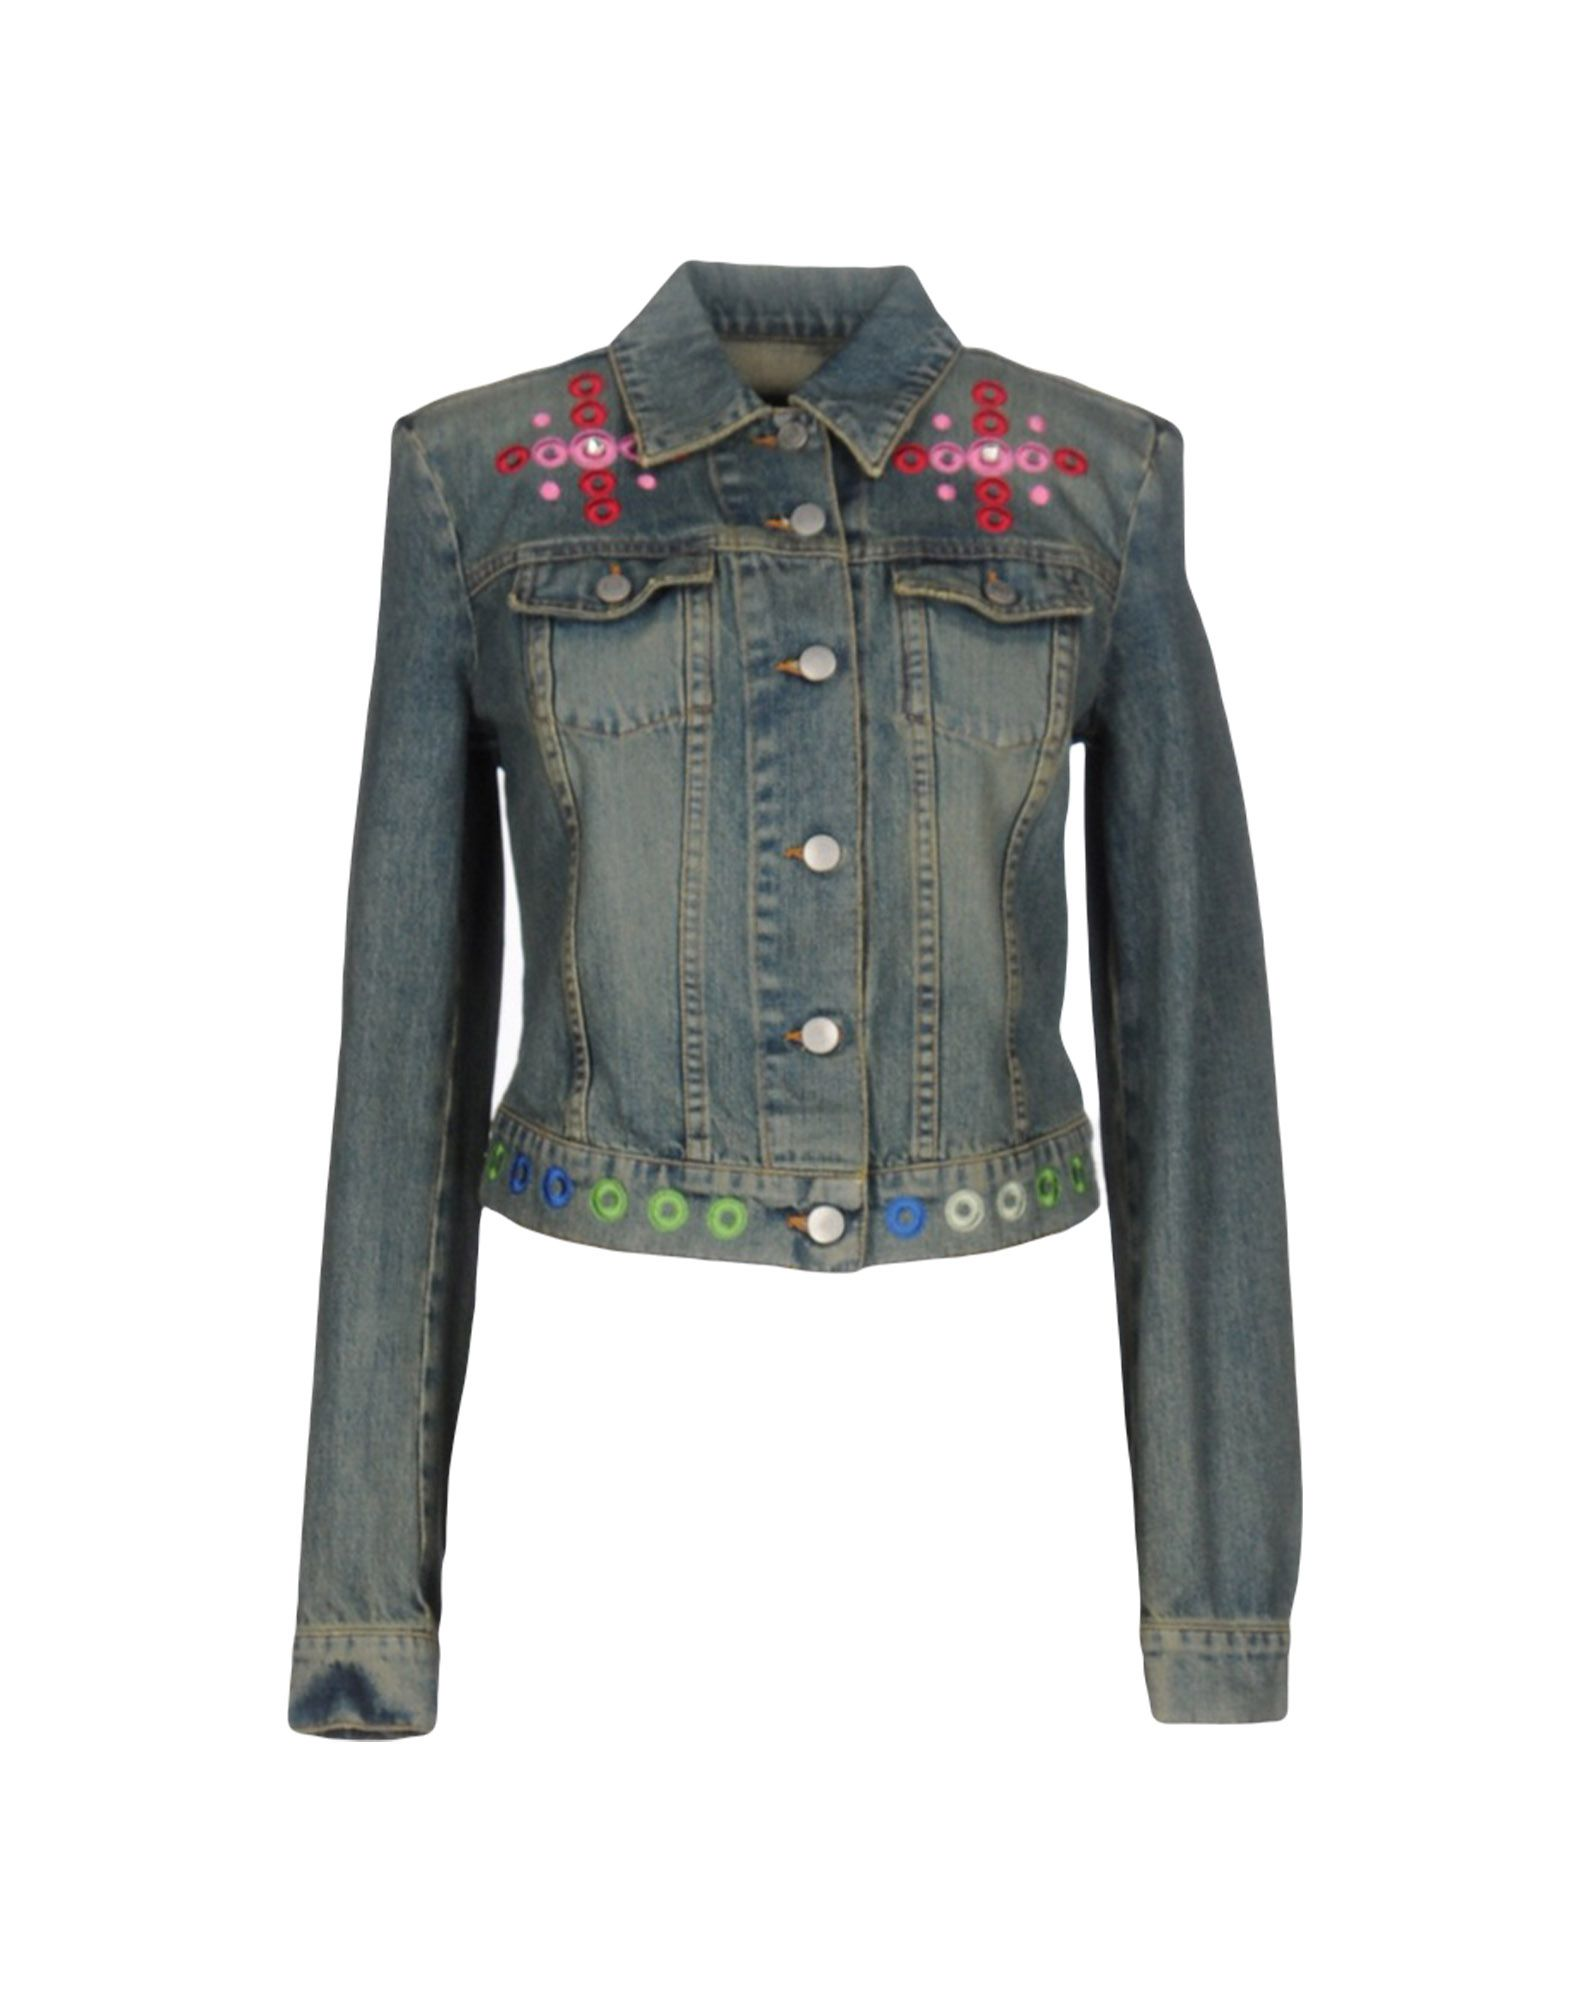 richmond джинсовая верхняя одежда JOHN RICHMOND Джинсовая верхняя одежда